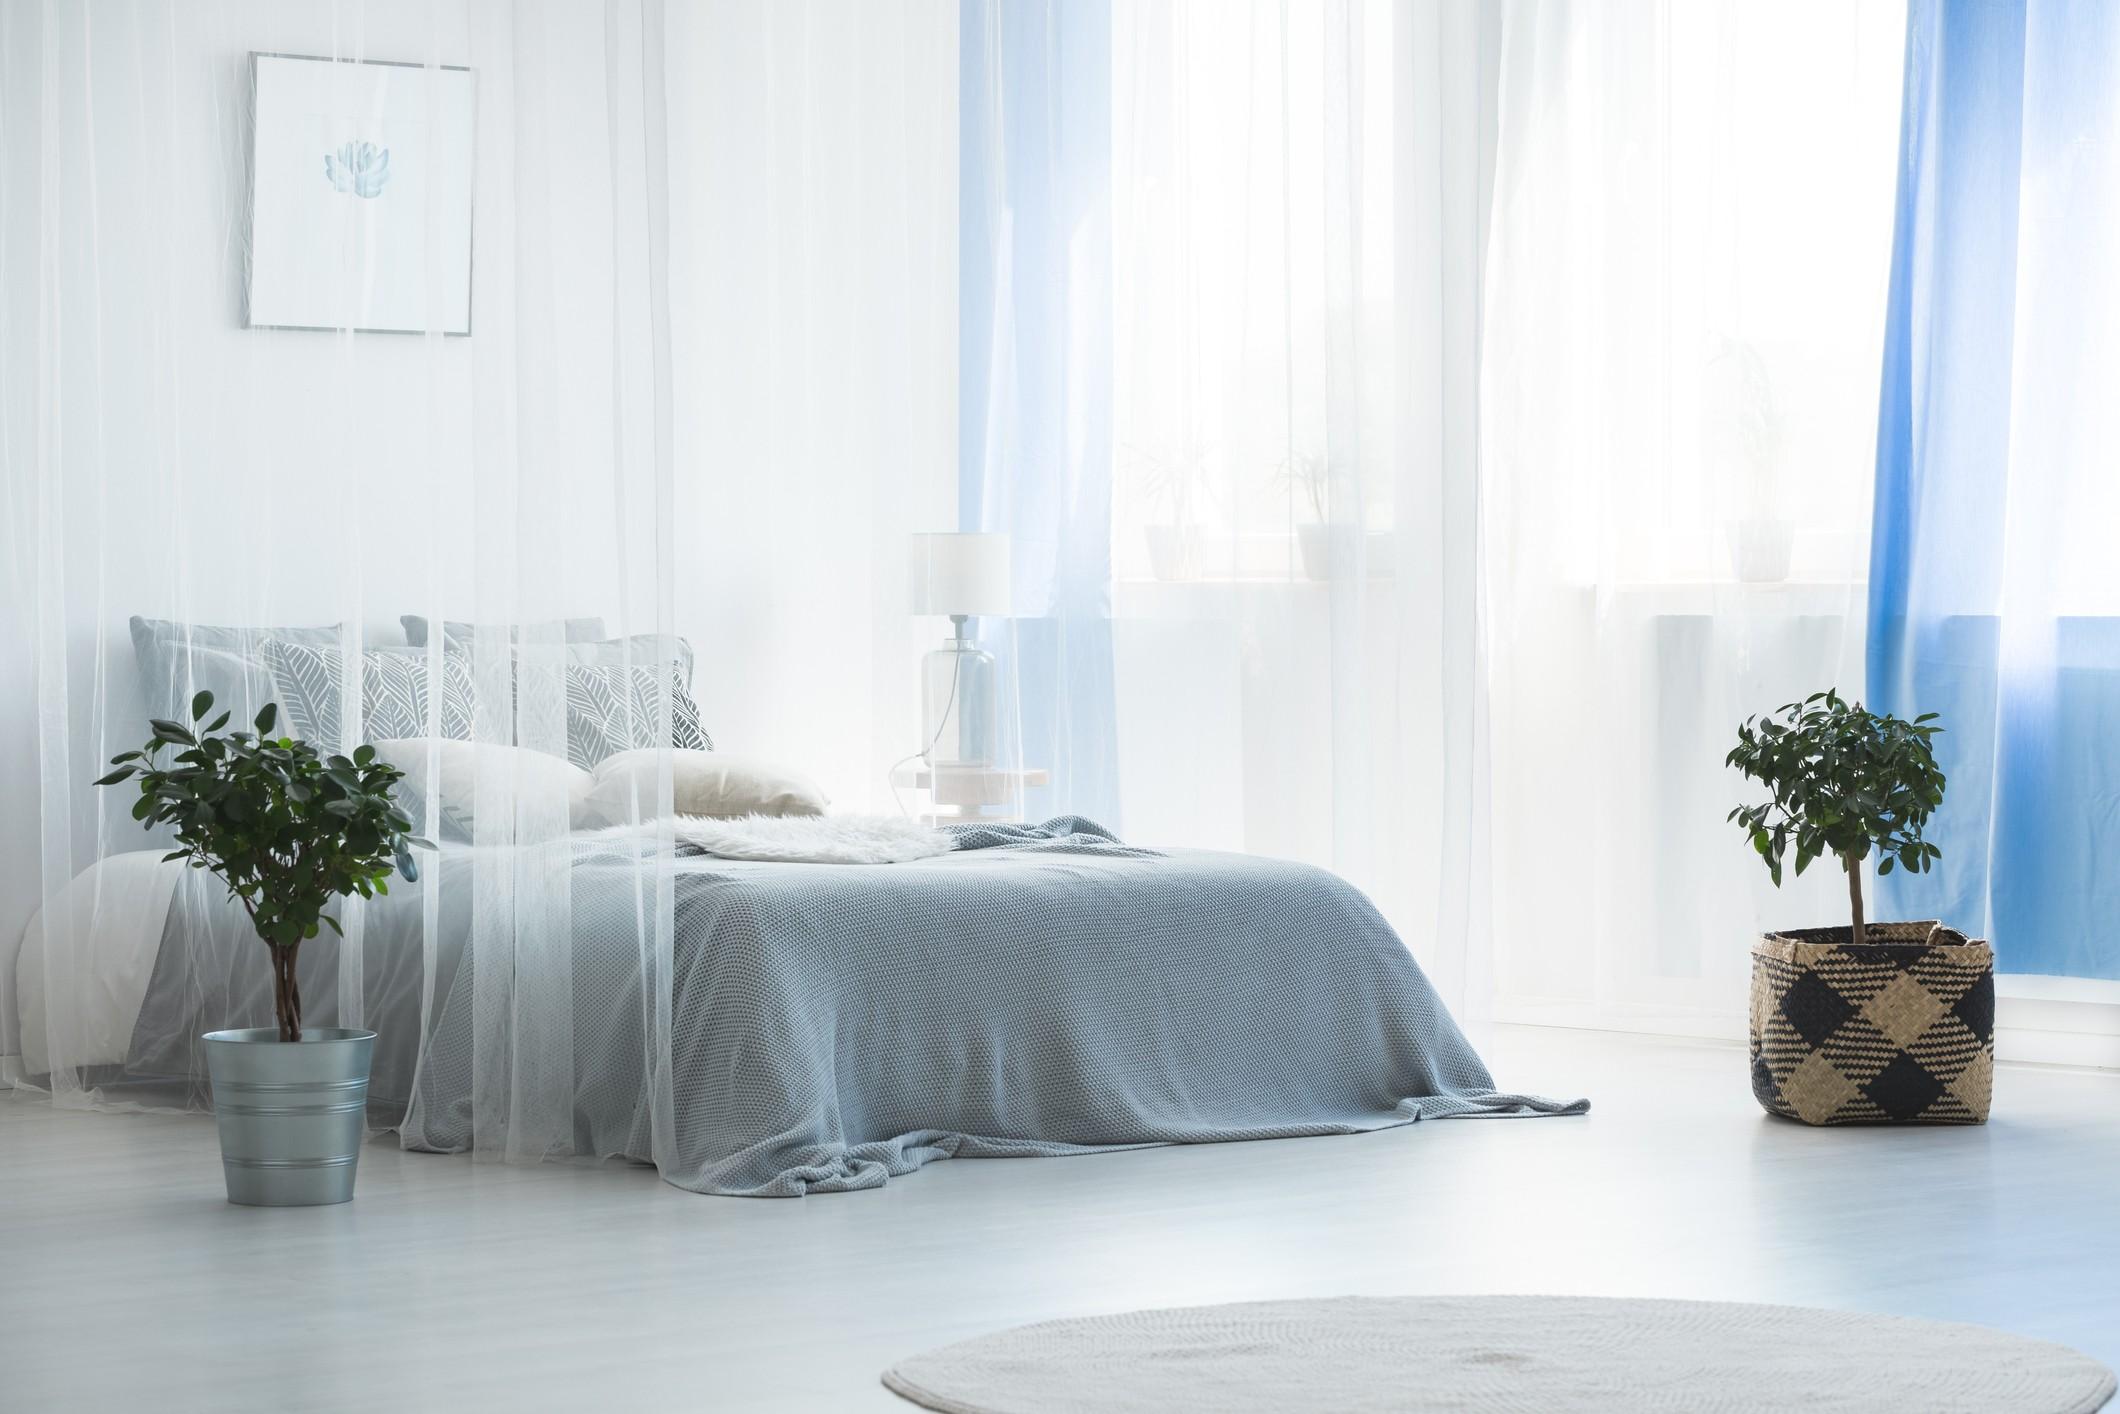 Canoby bed in calming blue bedroom